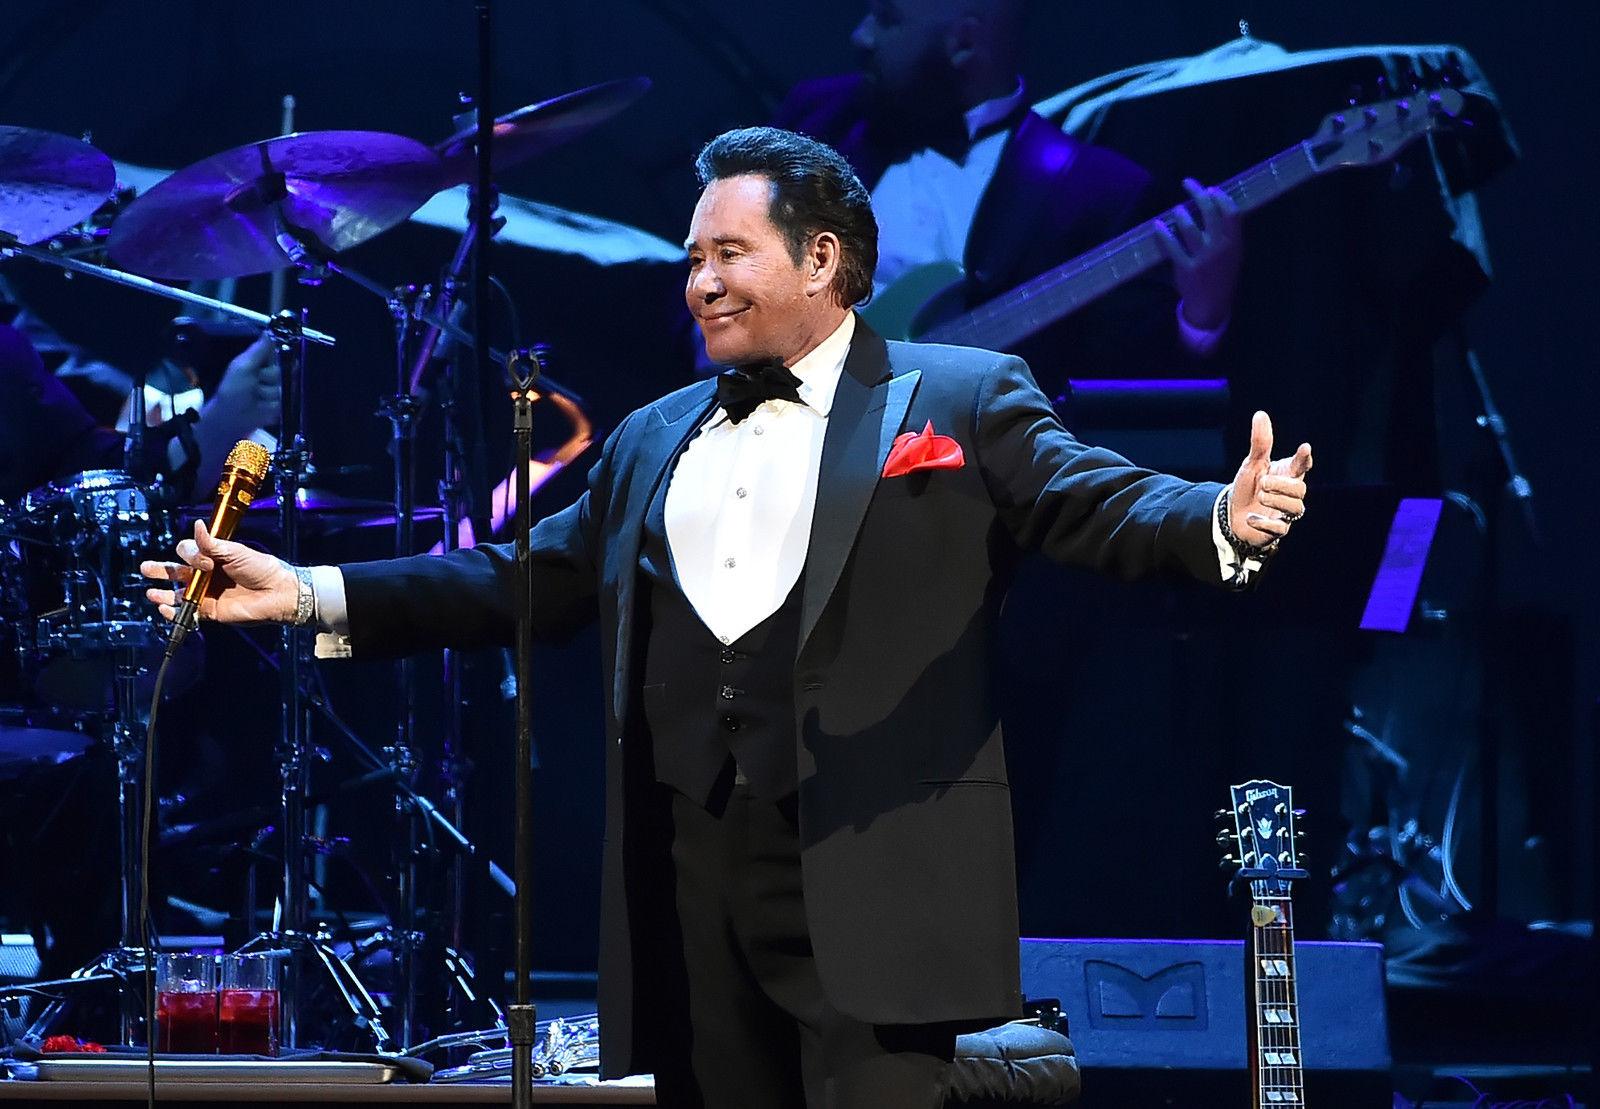 Saban Theatre Wayne Newton | Music News | Las Vegas Music